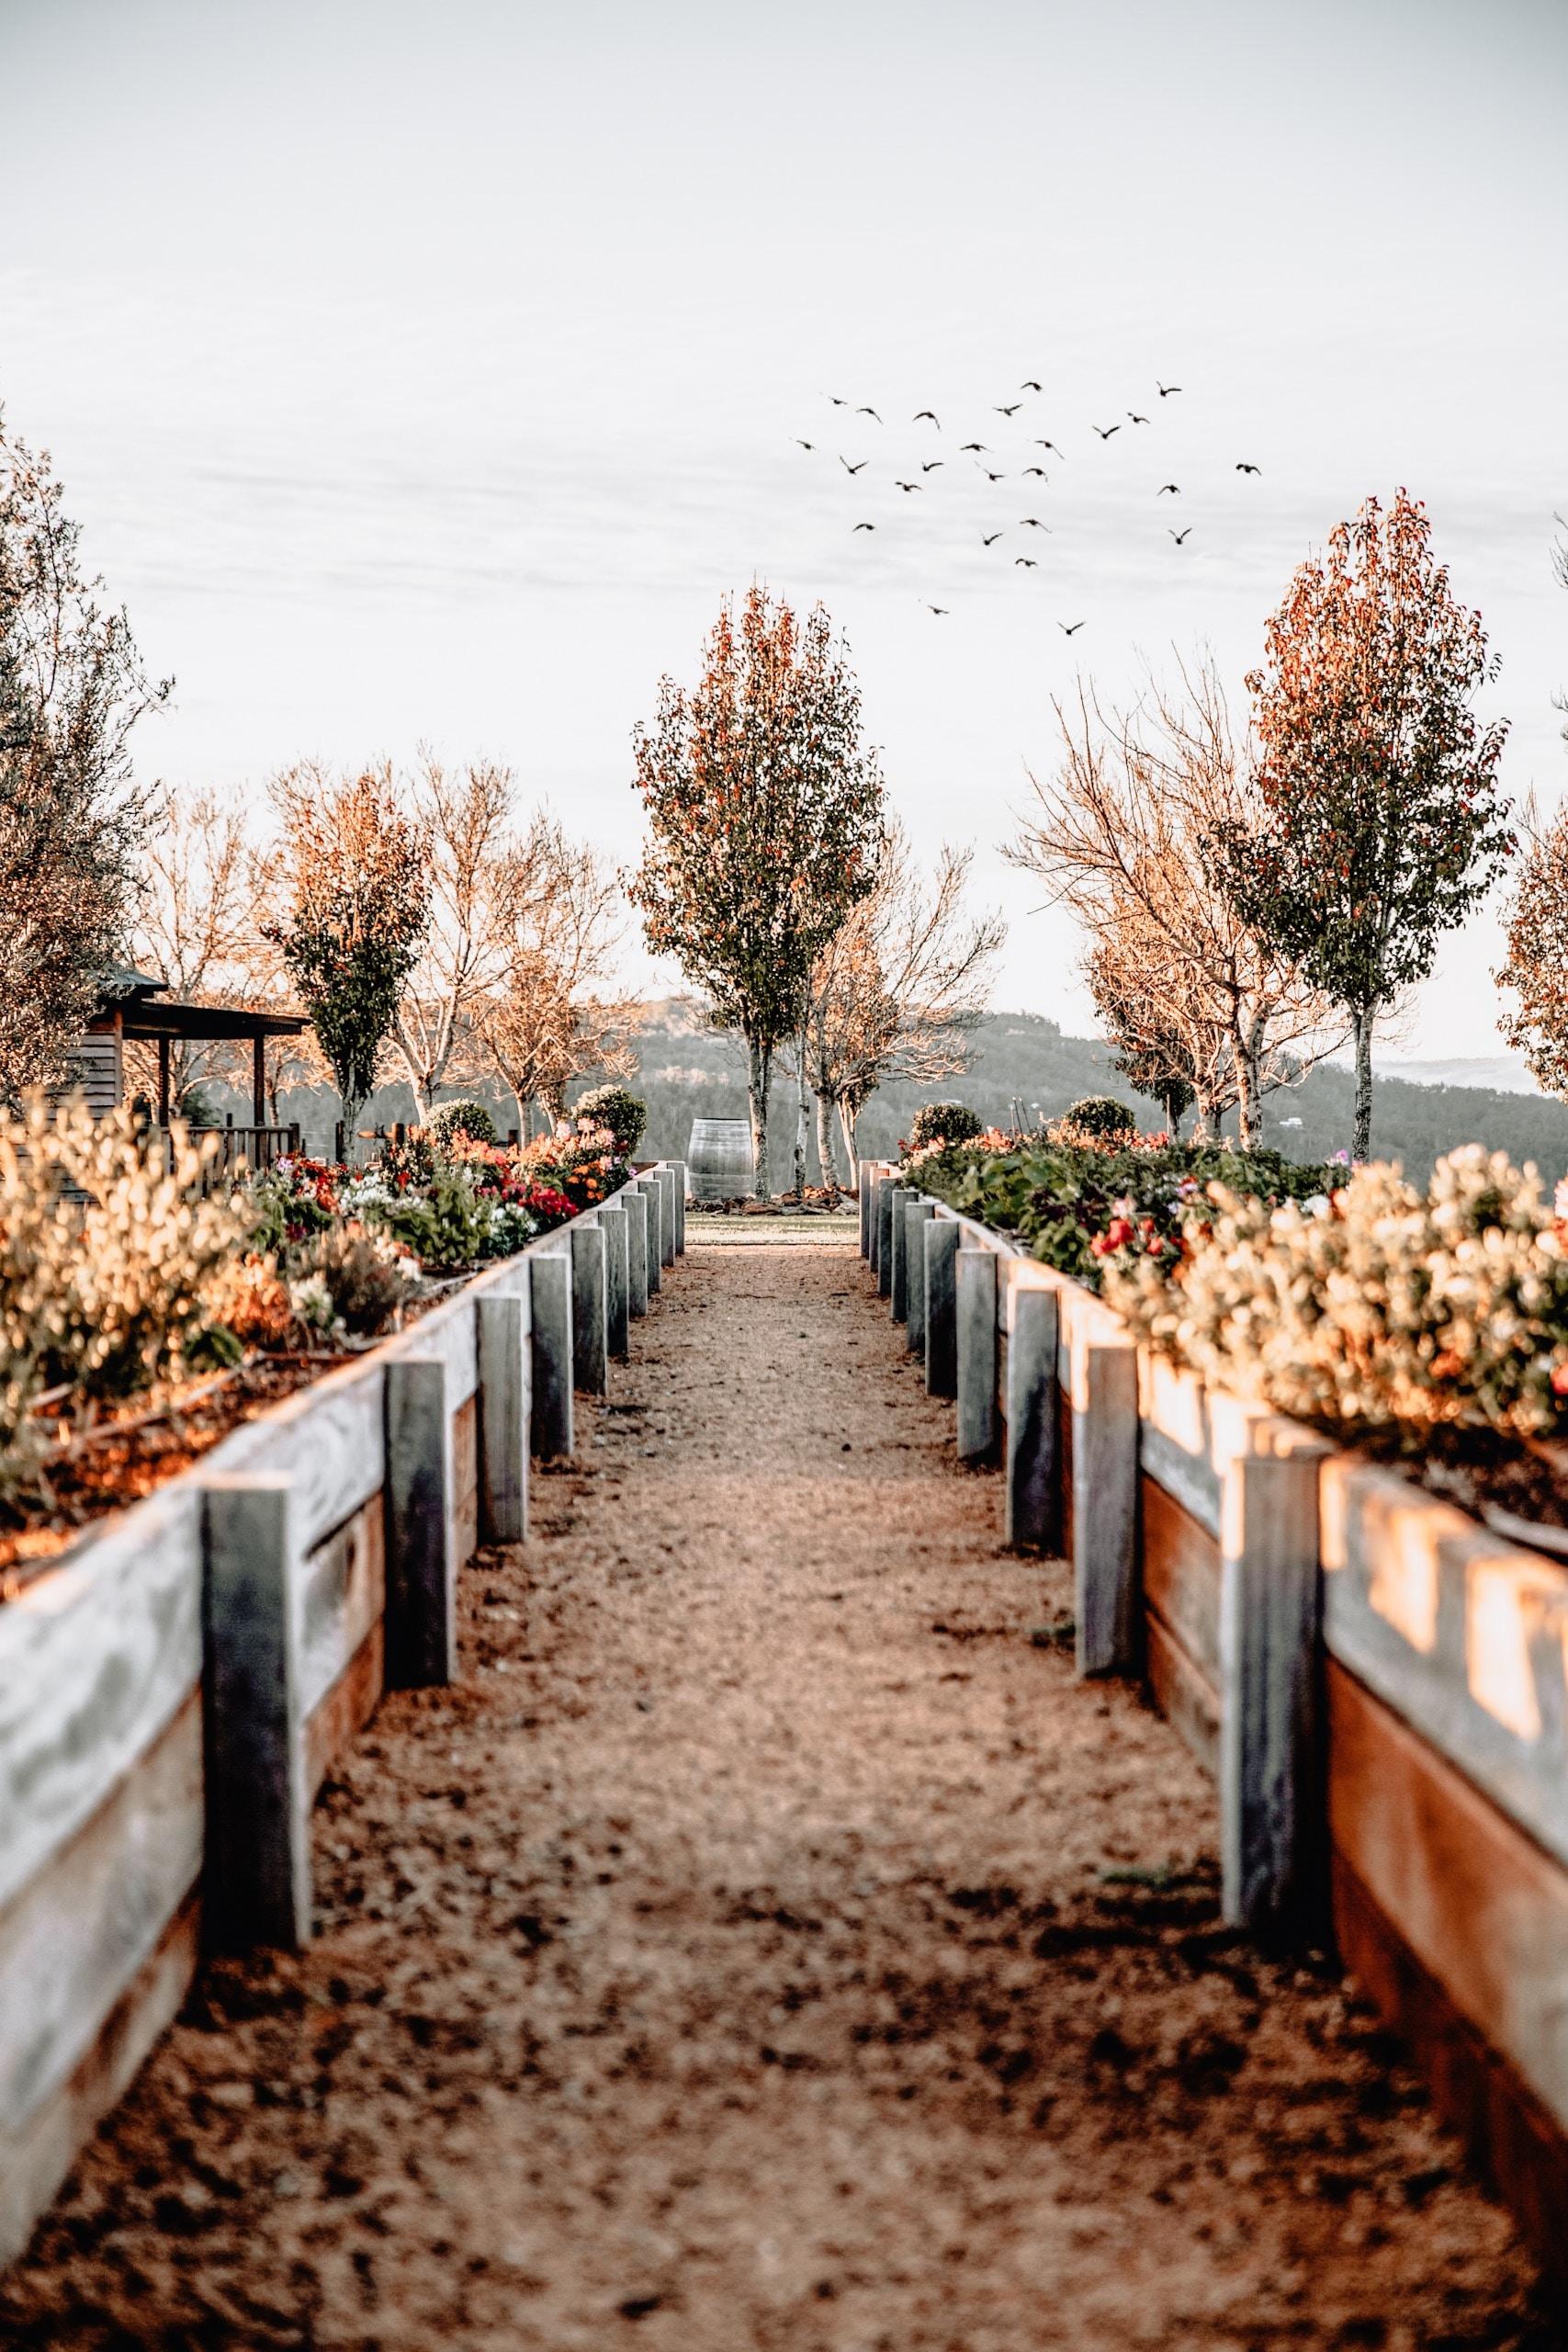 pathway between two wooden fences